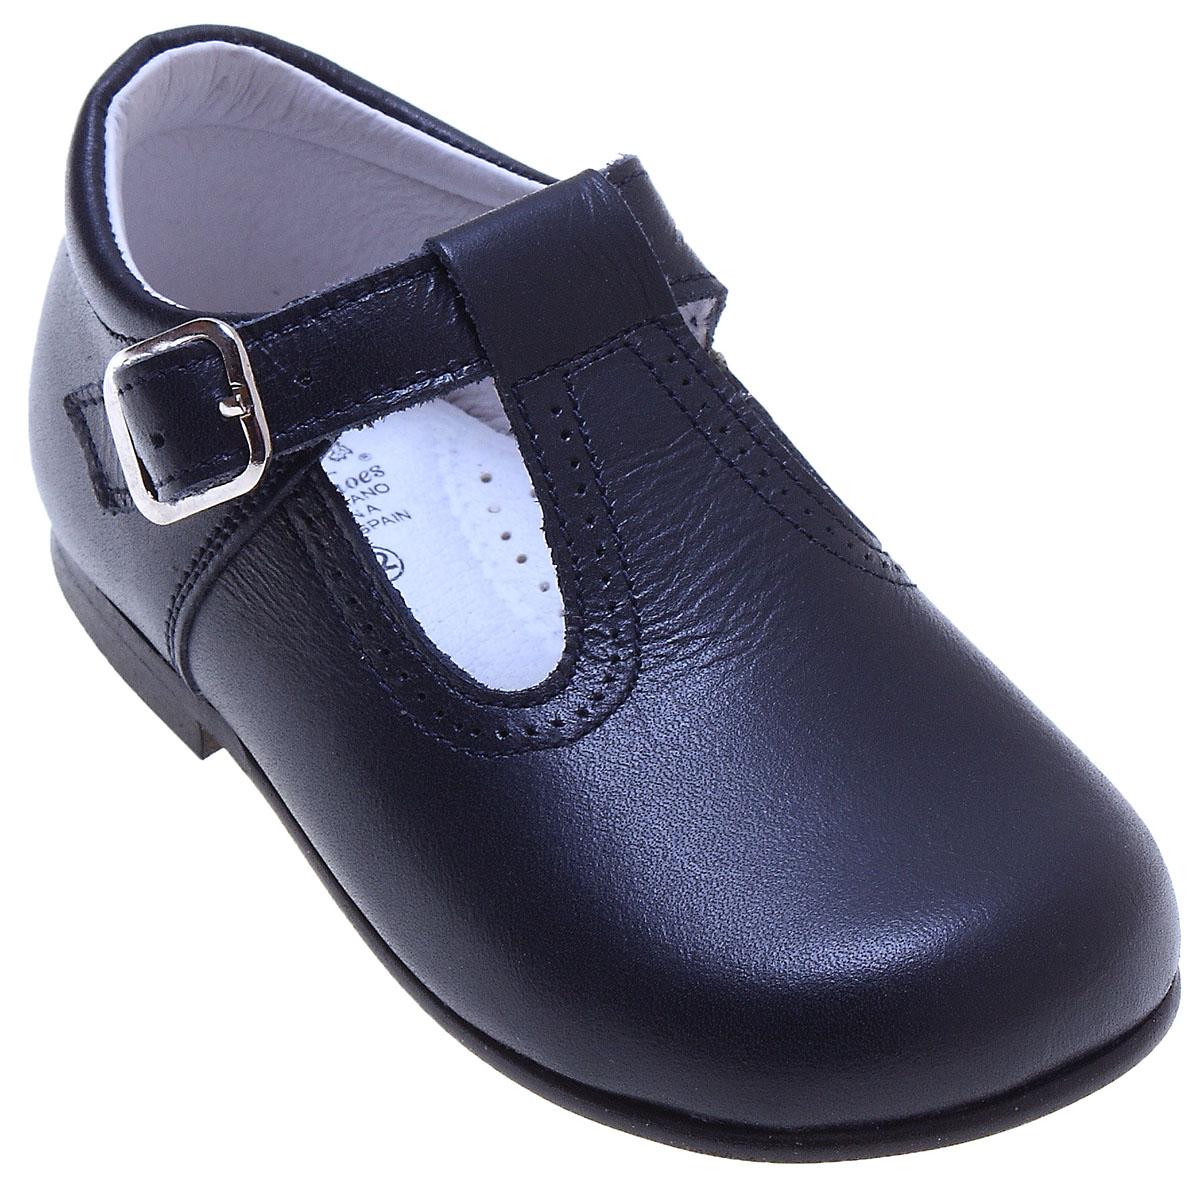 Buckle Boys Shoes